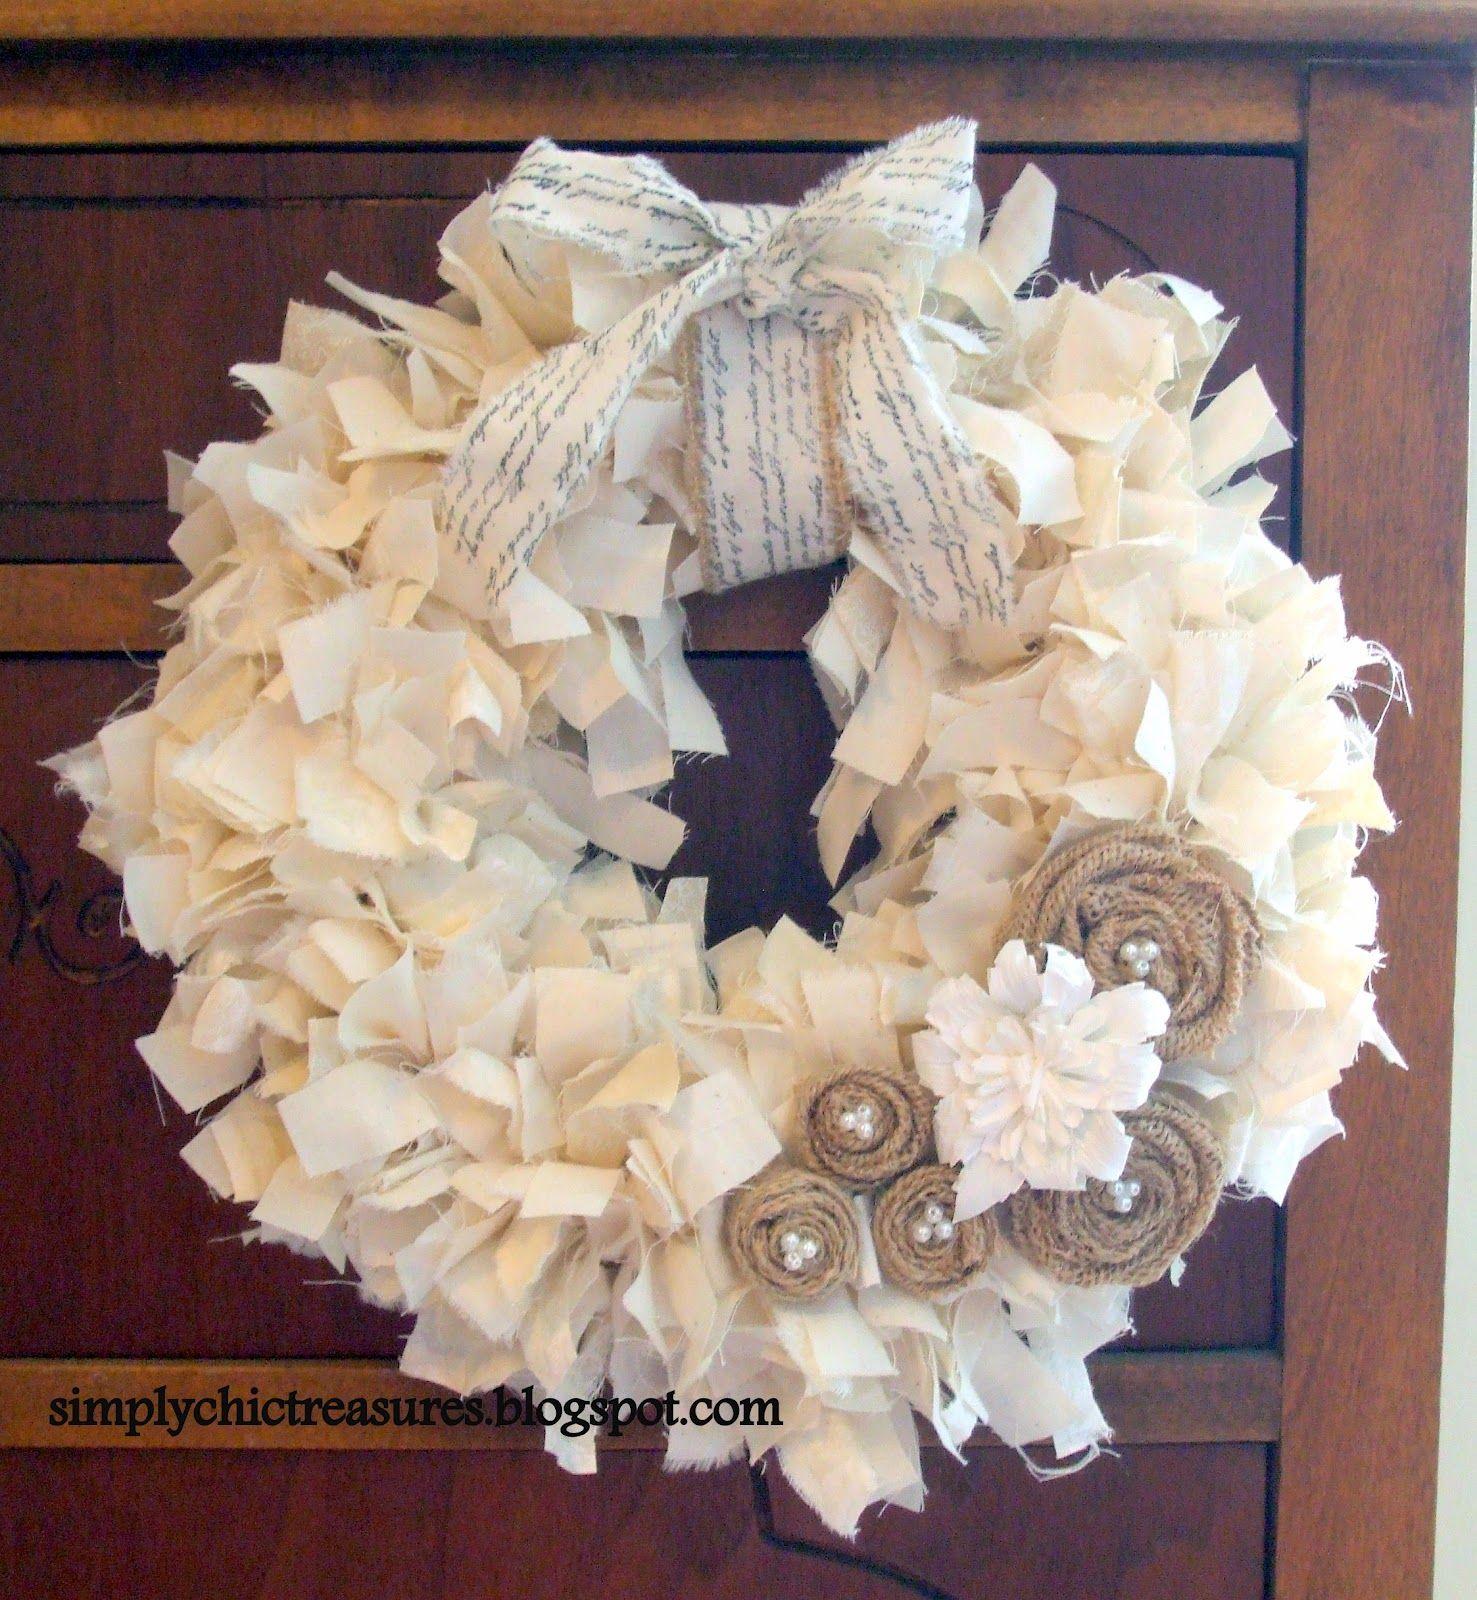 Blukatkraft Easy Diy Scrap Fabric Ribbon Wreath: Simply Chic Treasures: Muslin Rag Wreath